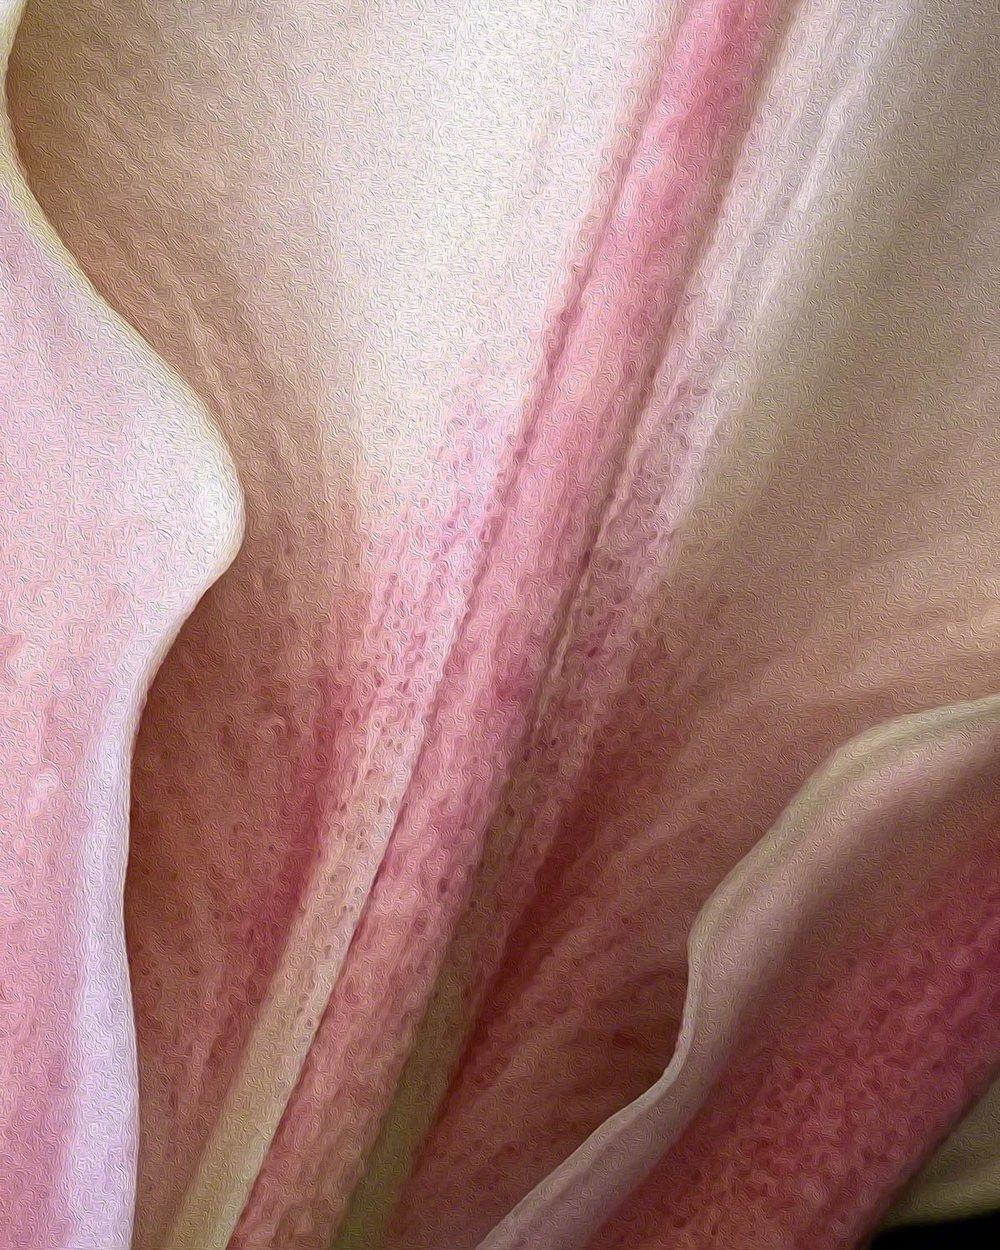 Sensual Form - 16